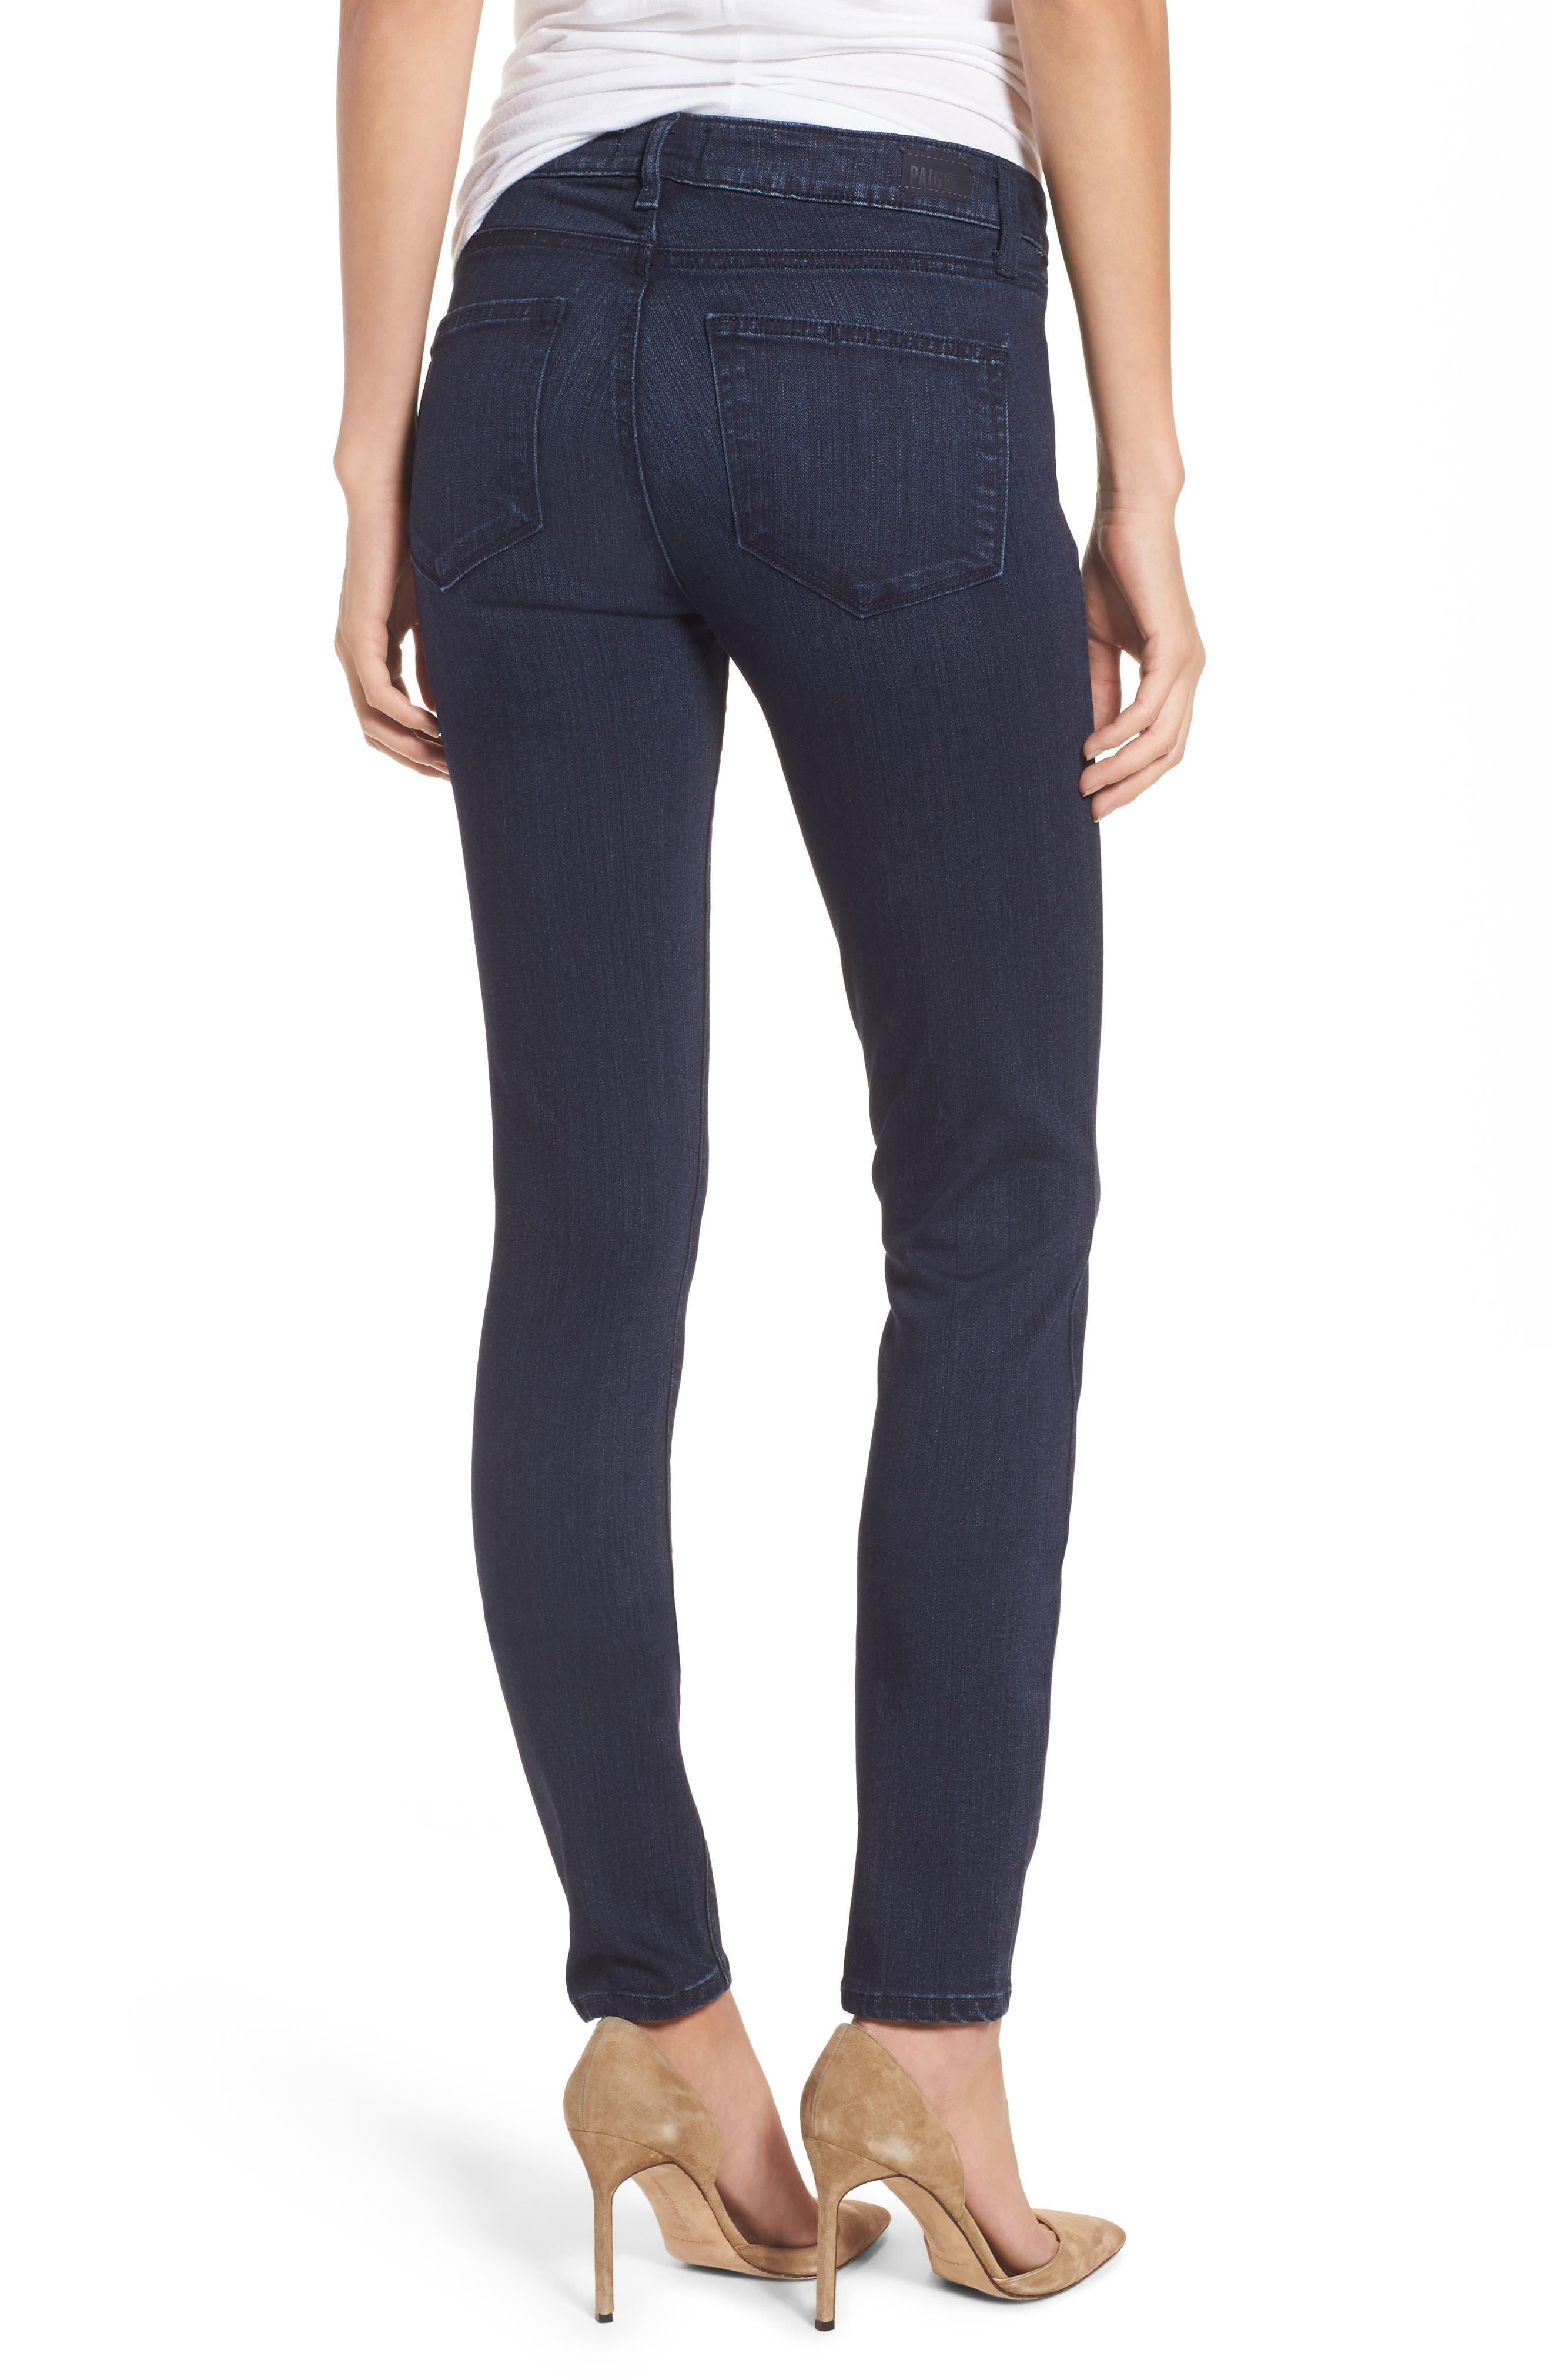 Alternate Image 3  - PAIGE Transcend - Verdugo Ultra Skinny Jeans (Hazen)